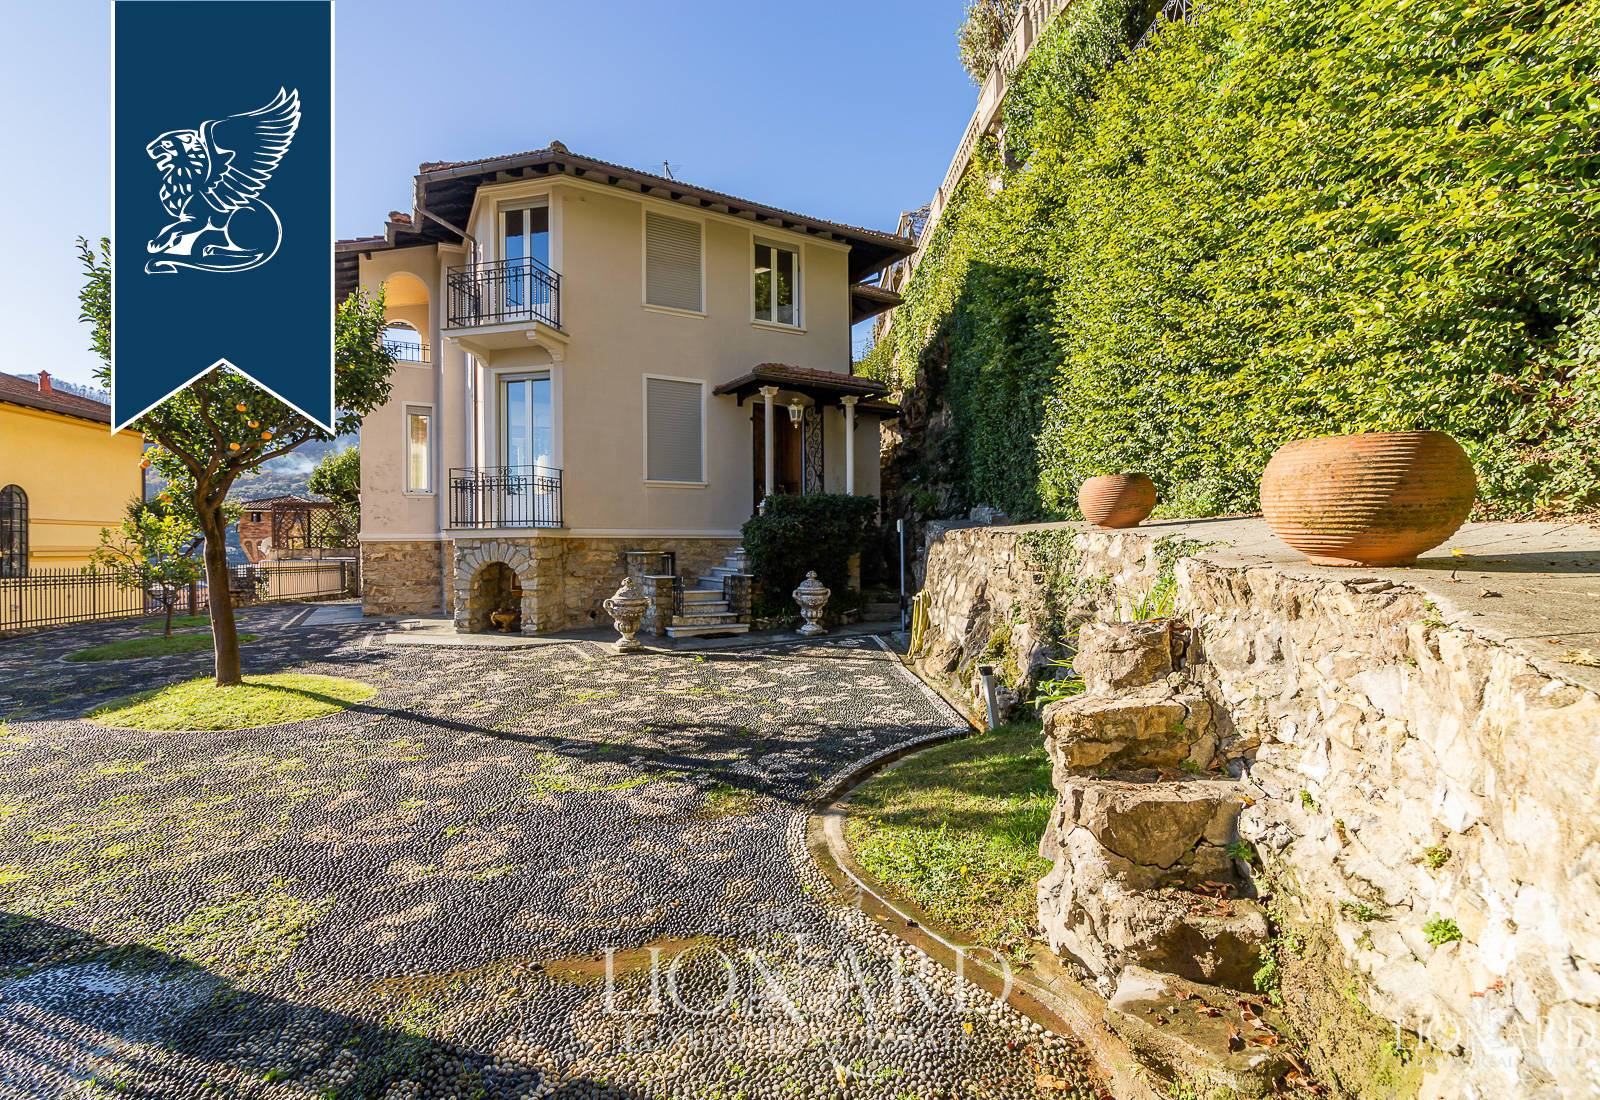 Villa in Vendita a Santa Margherita Ligure: 0 locali, 350 mq - Foto 8